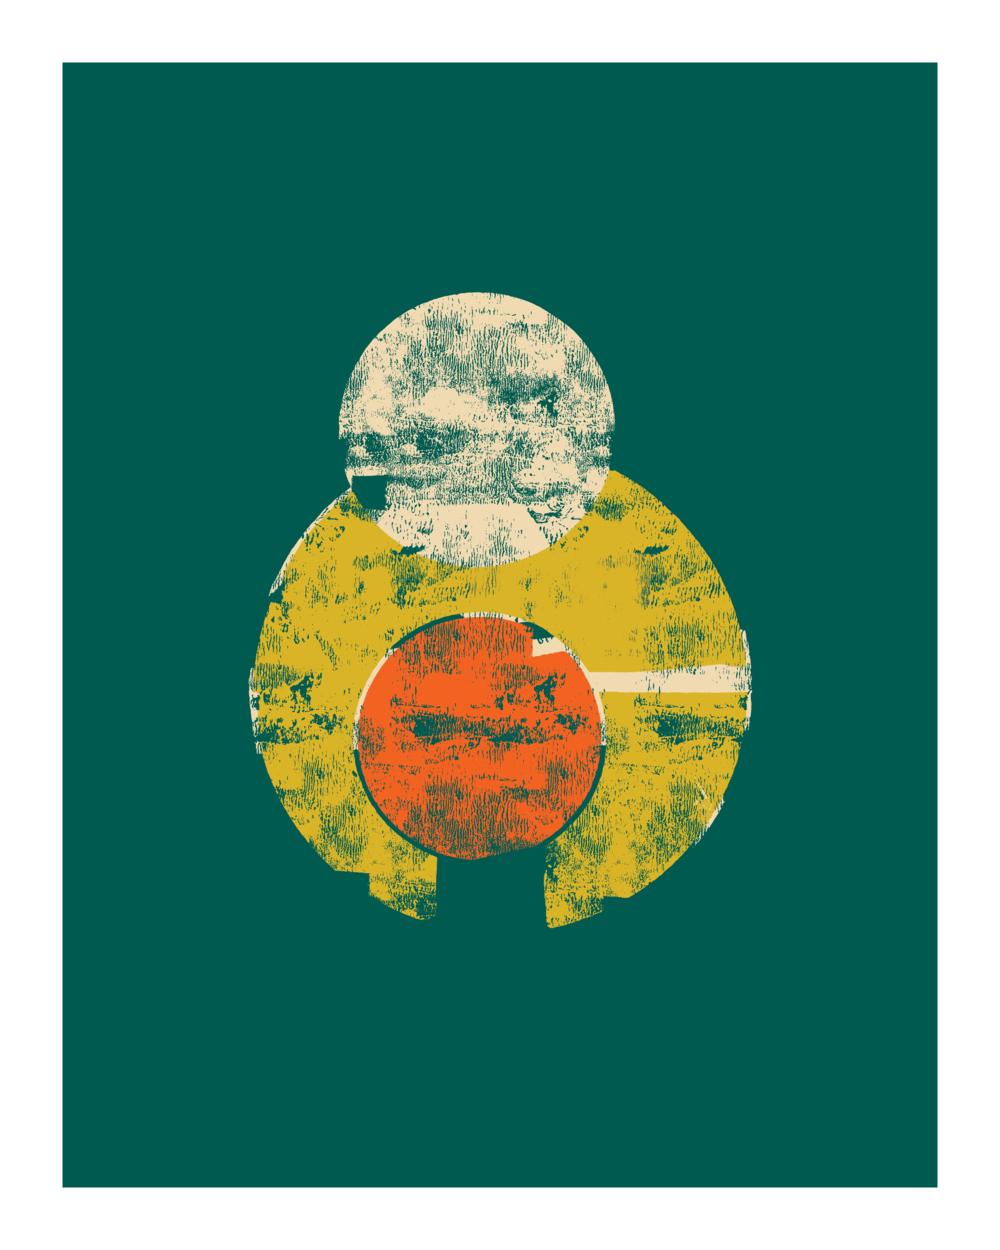 abstract_green_noborder.png